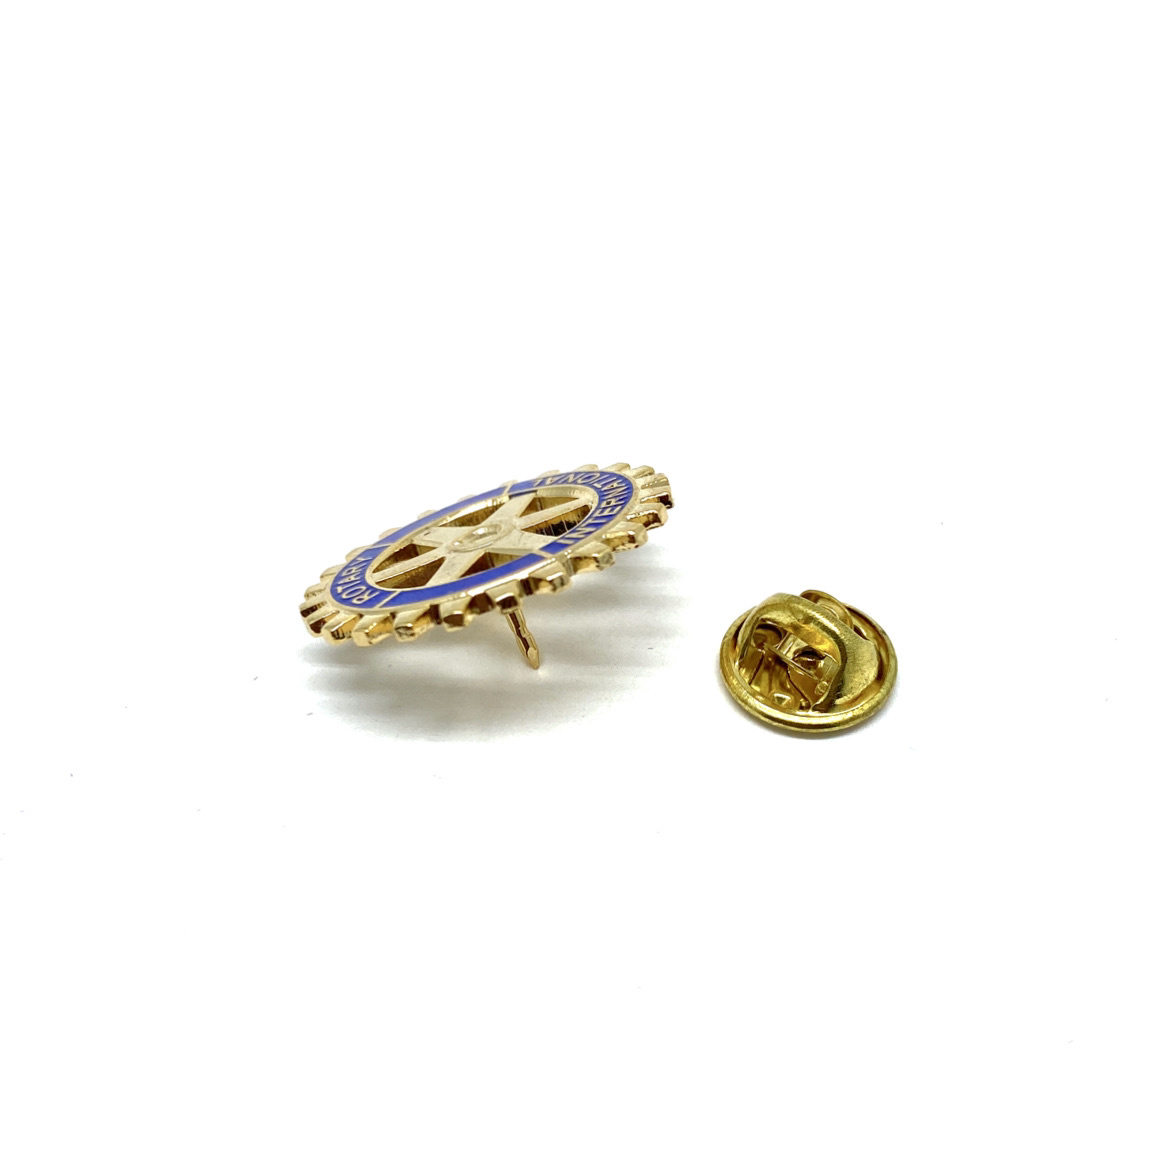 Pin Rotary 25 mm